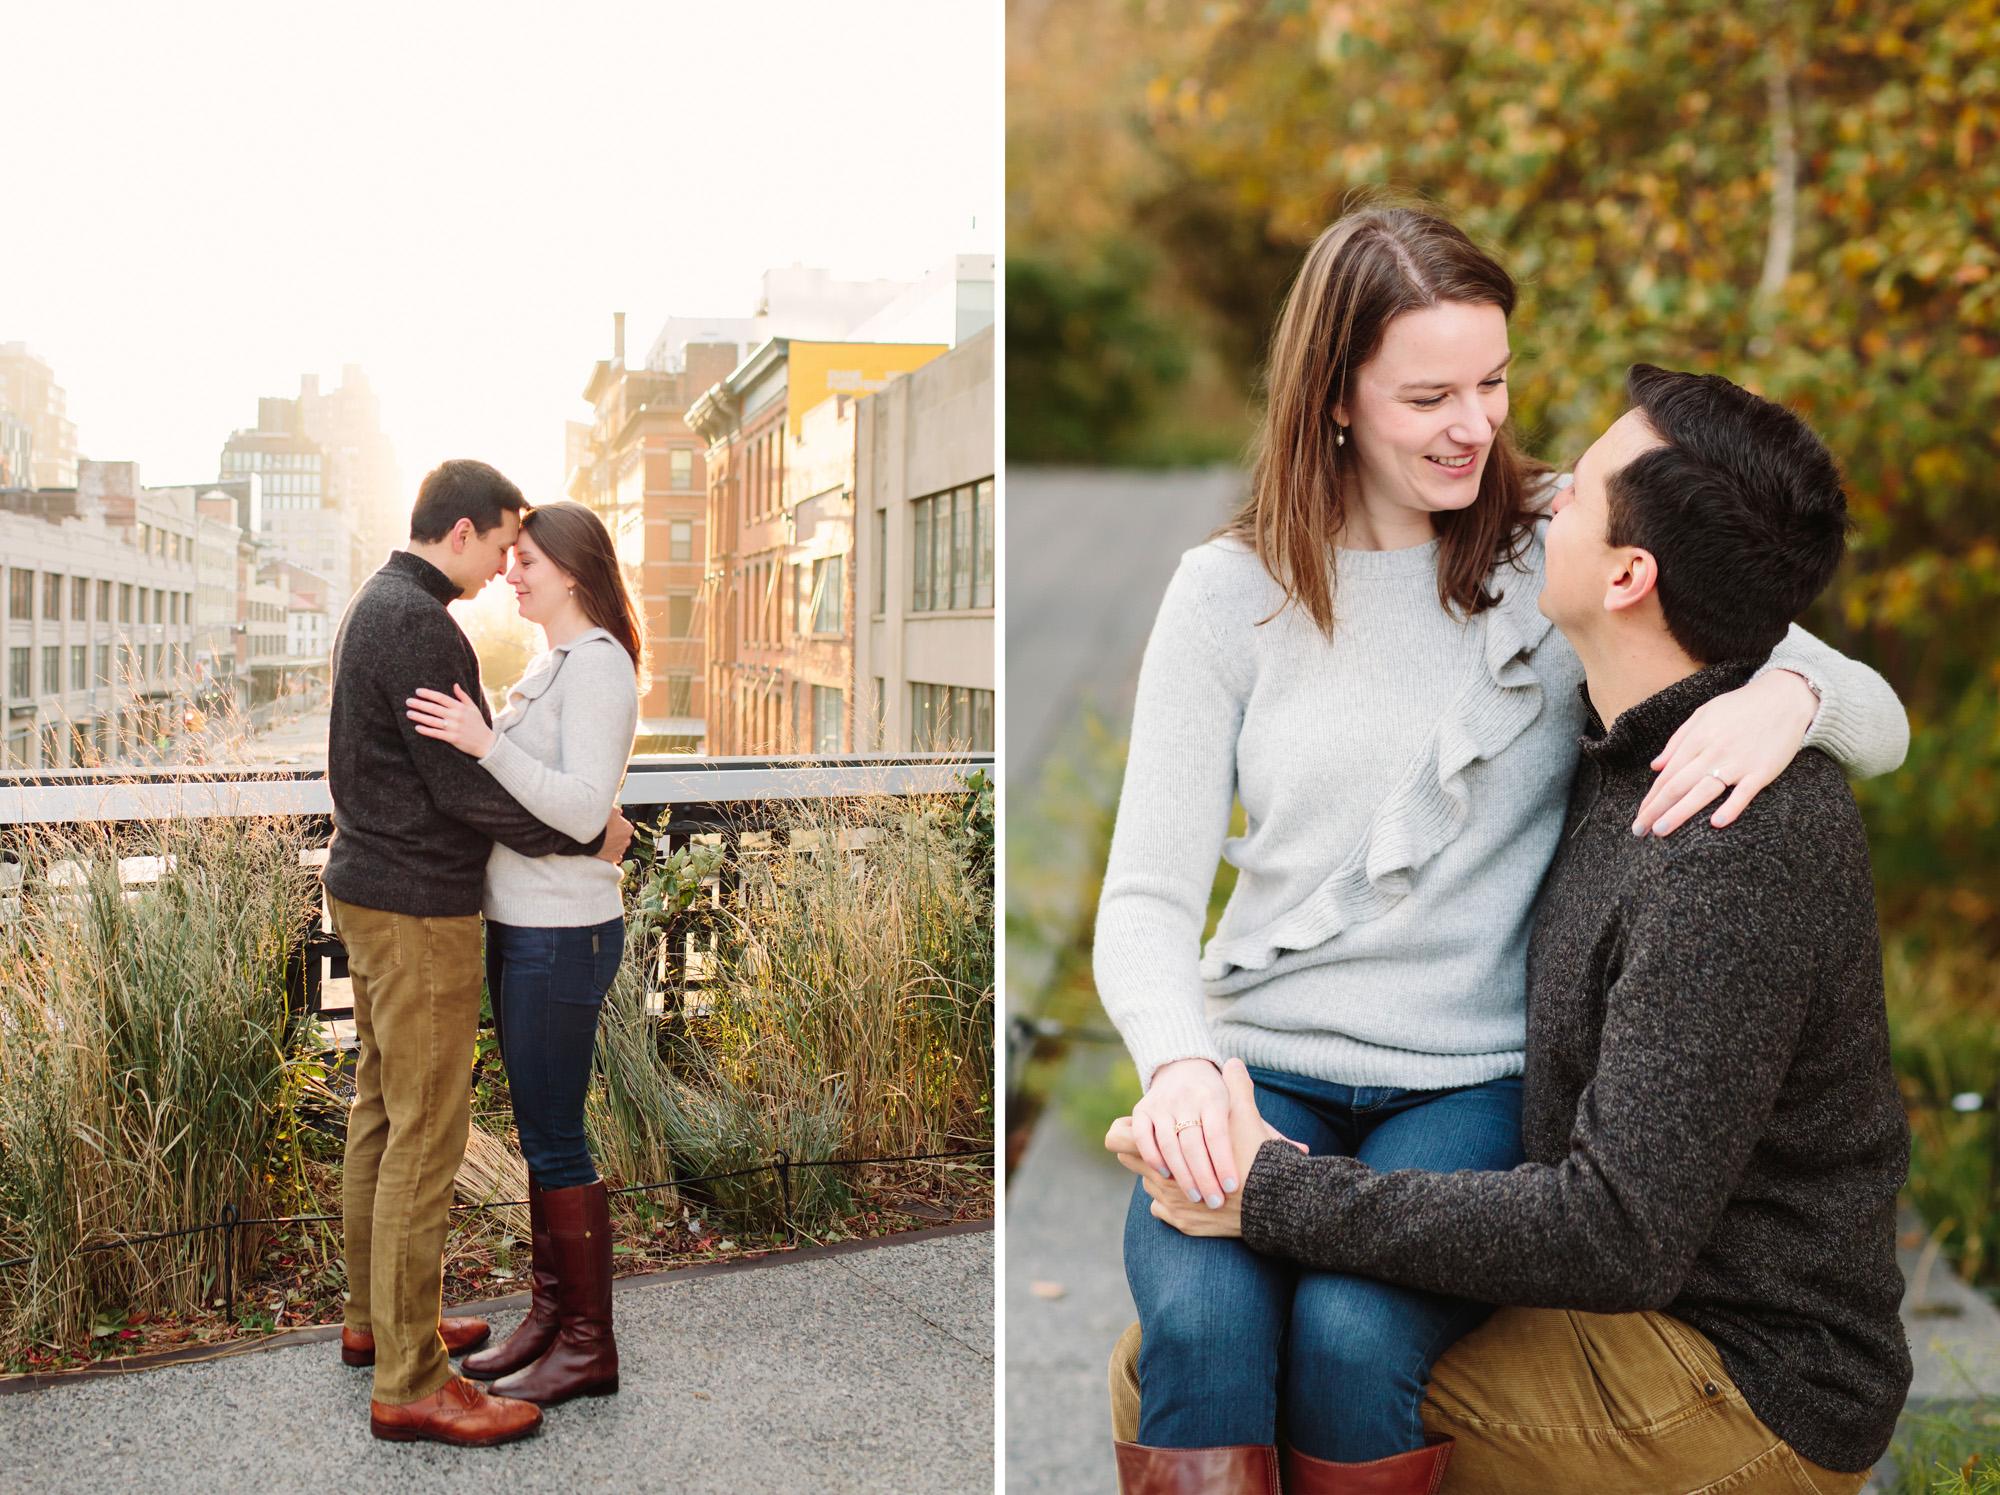 04_Sarah_Rob_The_Highline_New_York_City_Engagement_Photos.jpg